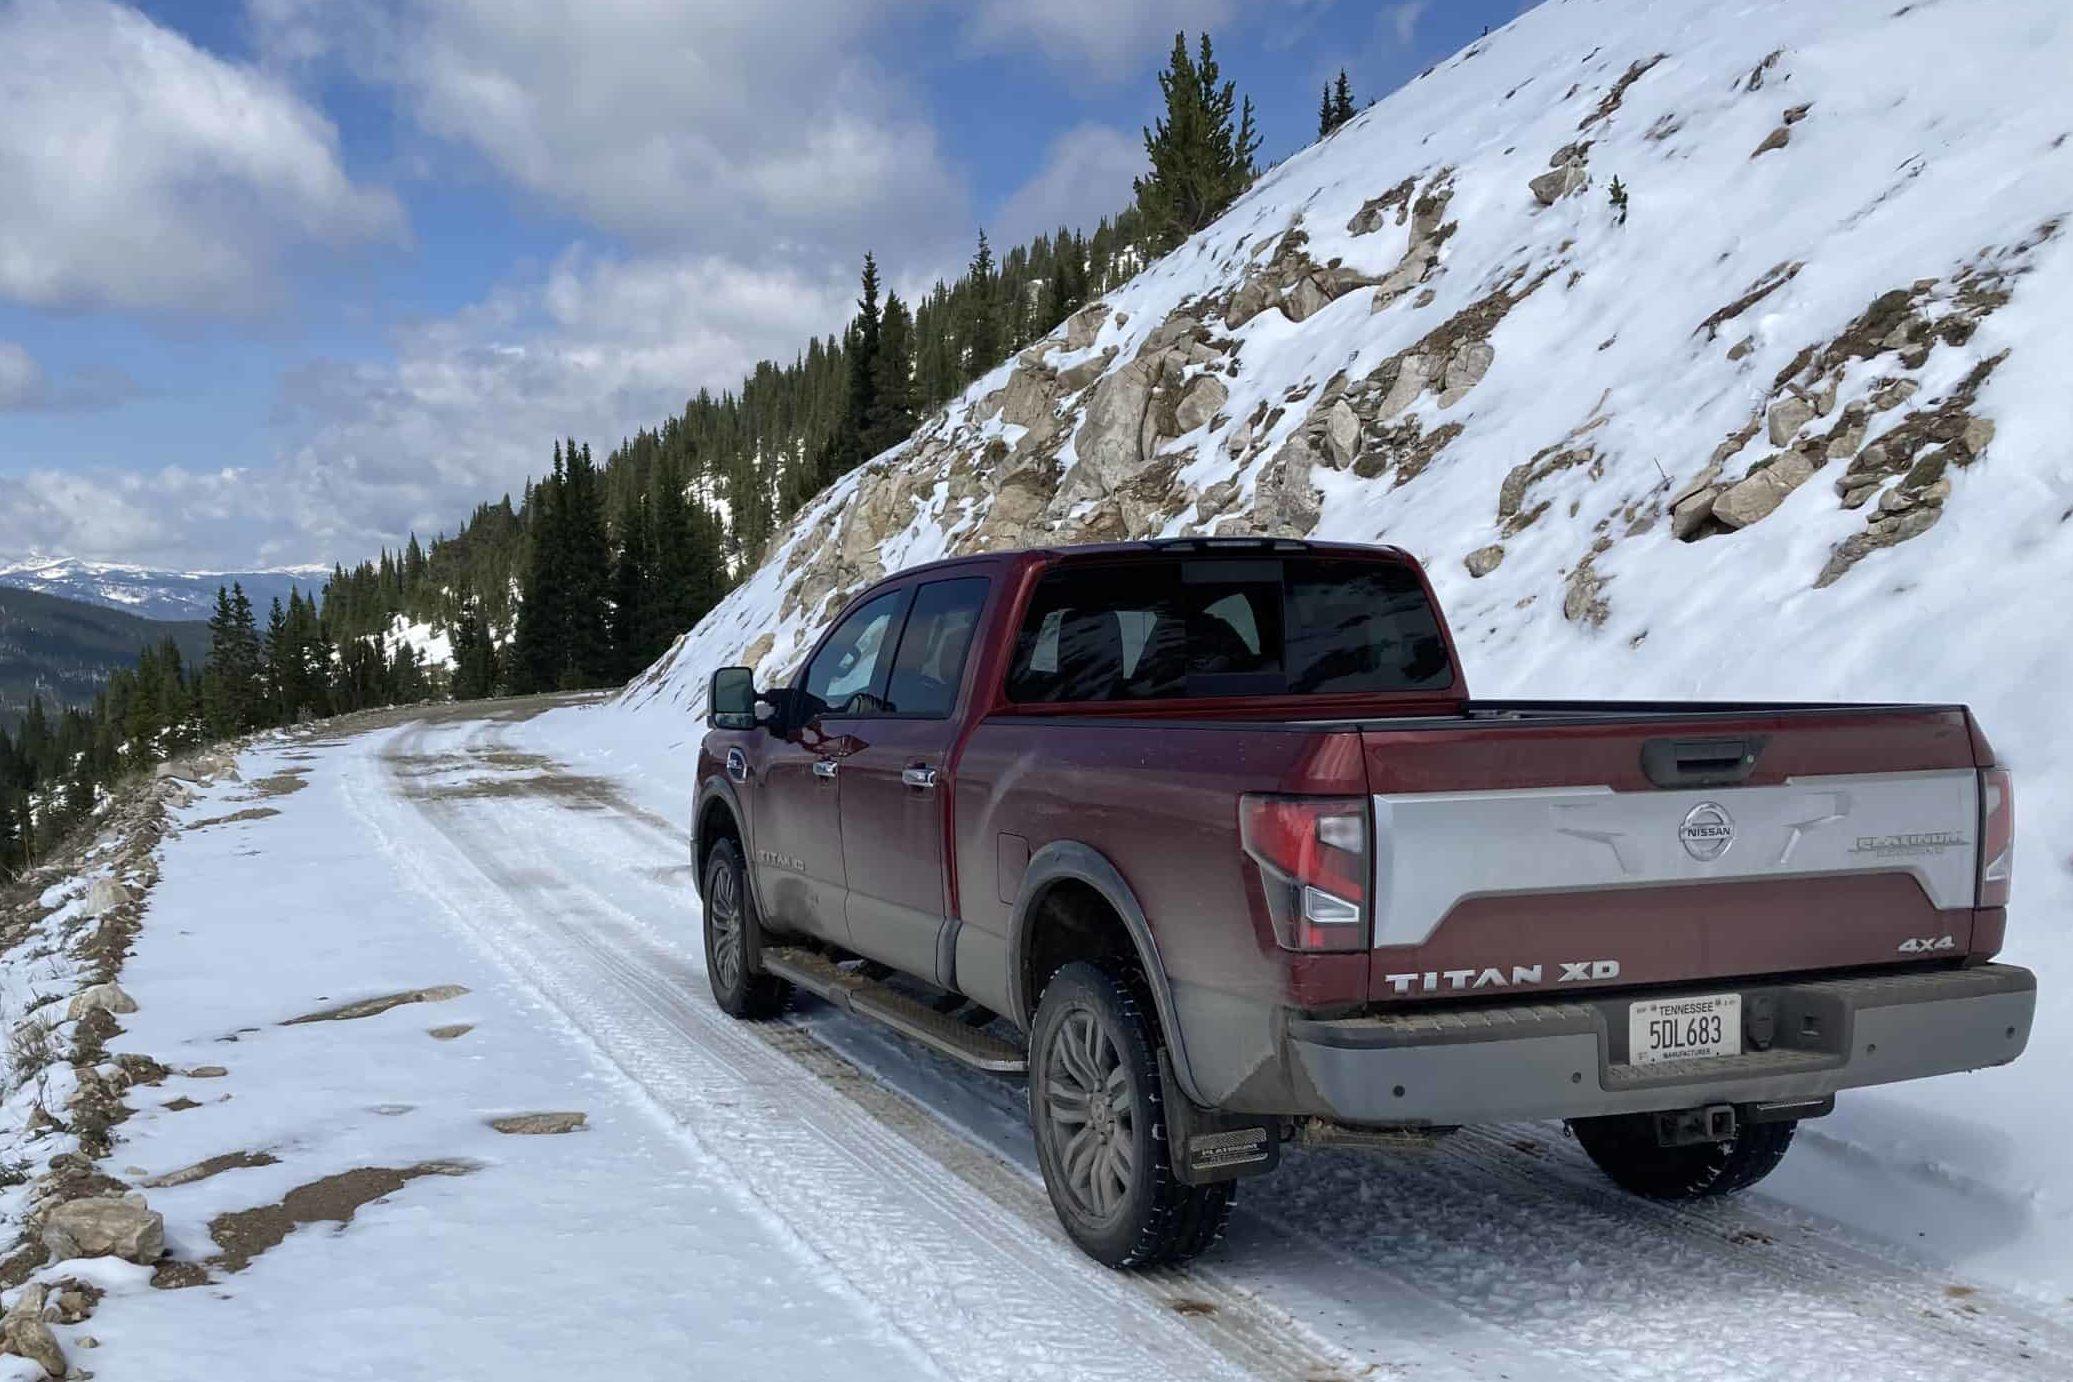 titan xd on snowy road